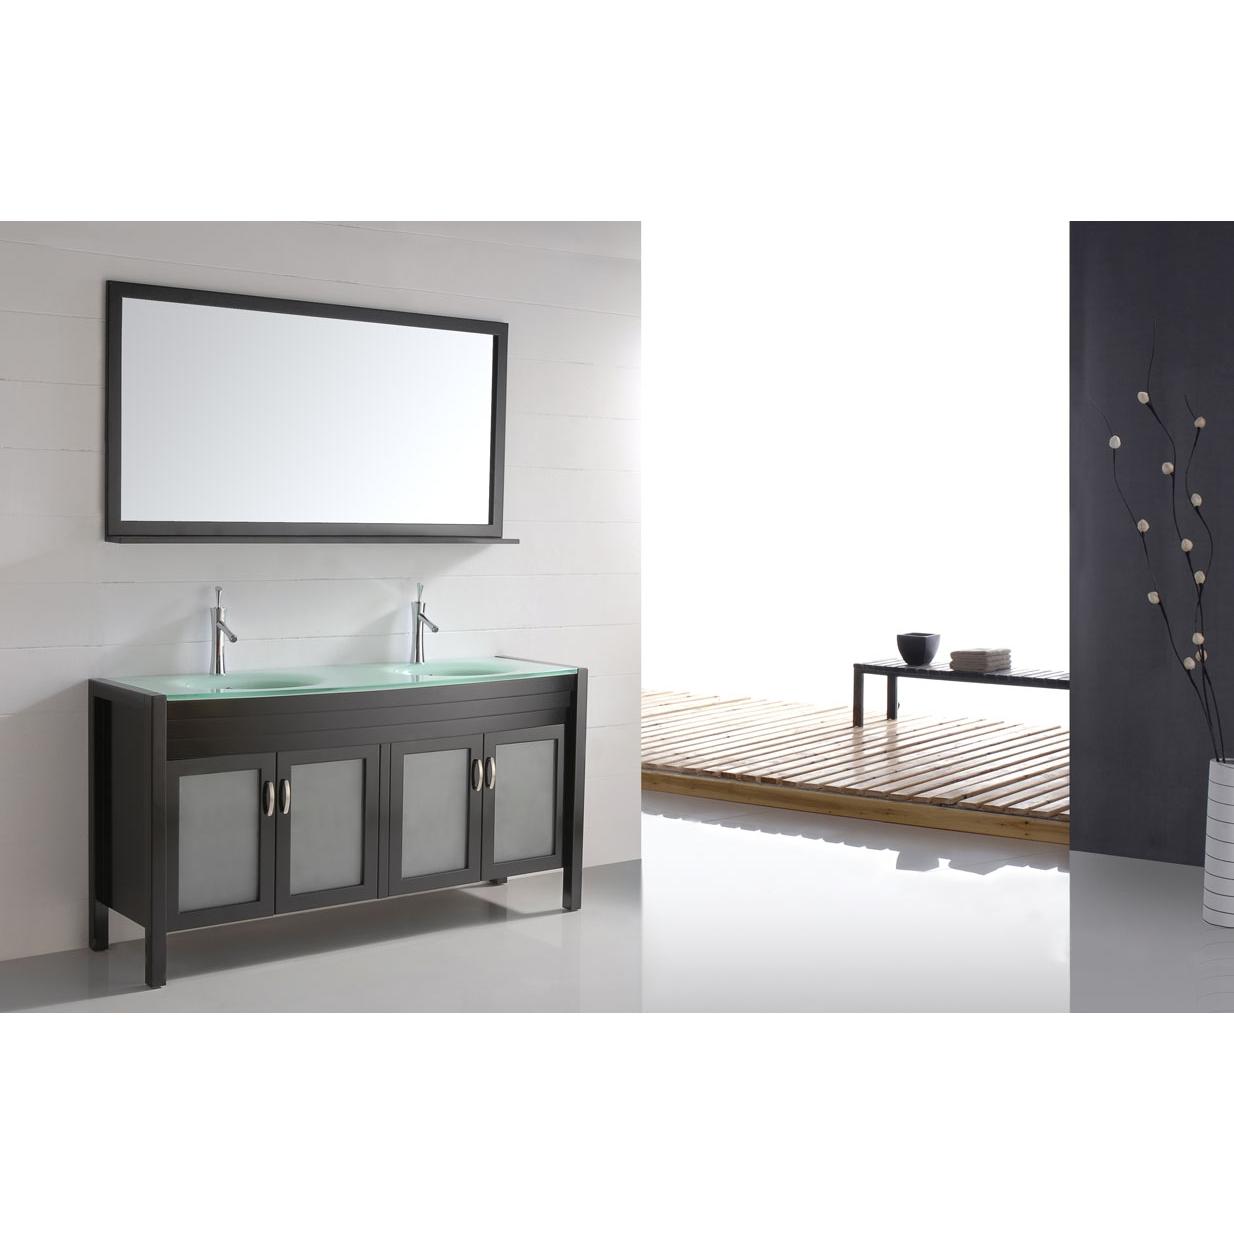 60 Solid Wood Double Sink Bathroom Vanity Glass Top Free Shipping Espresso Cb6011 Conceptbaths Com